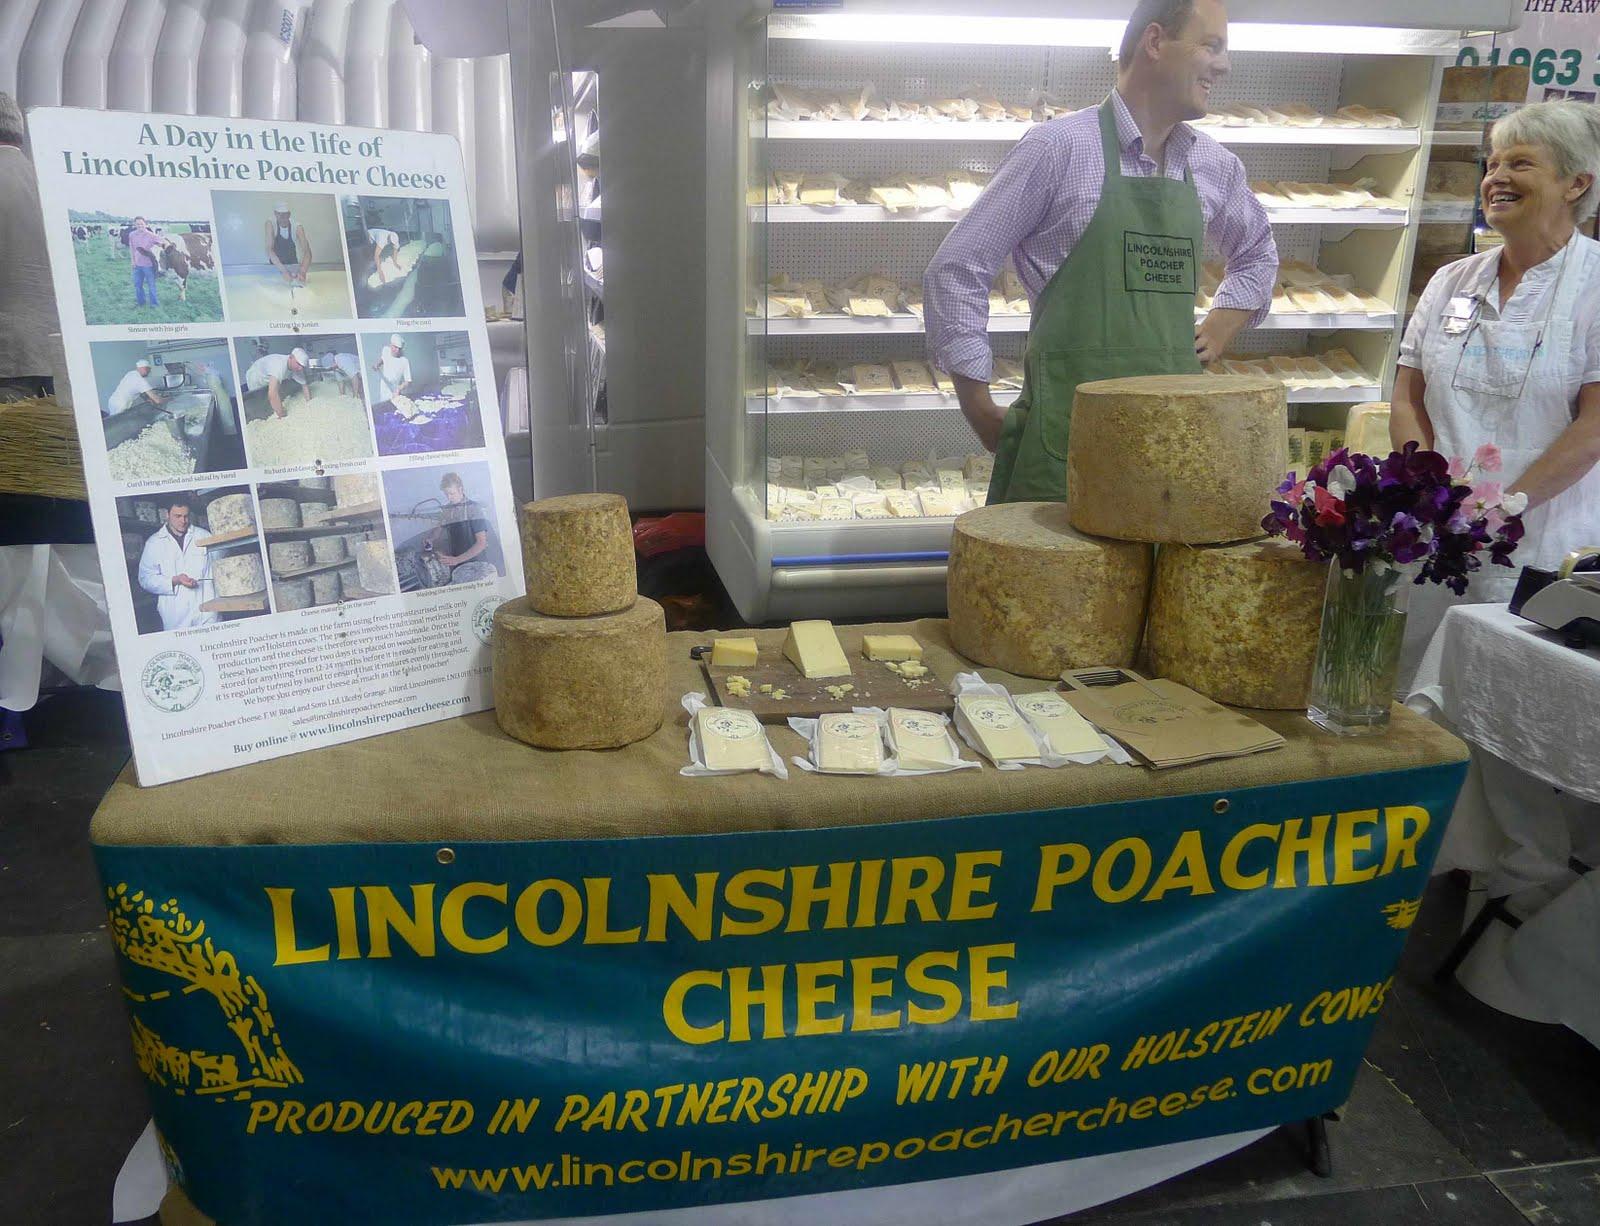 lincolnshire poacher cheese